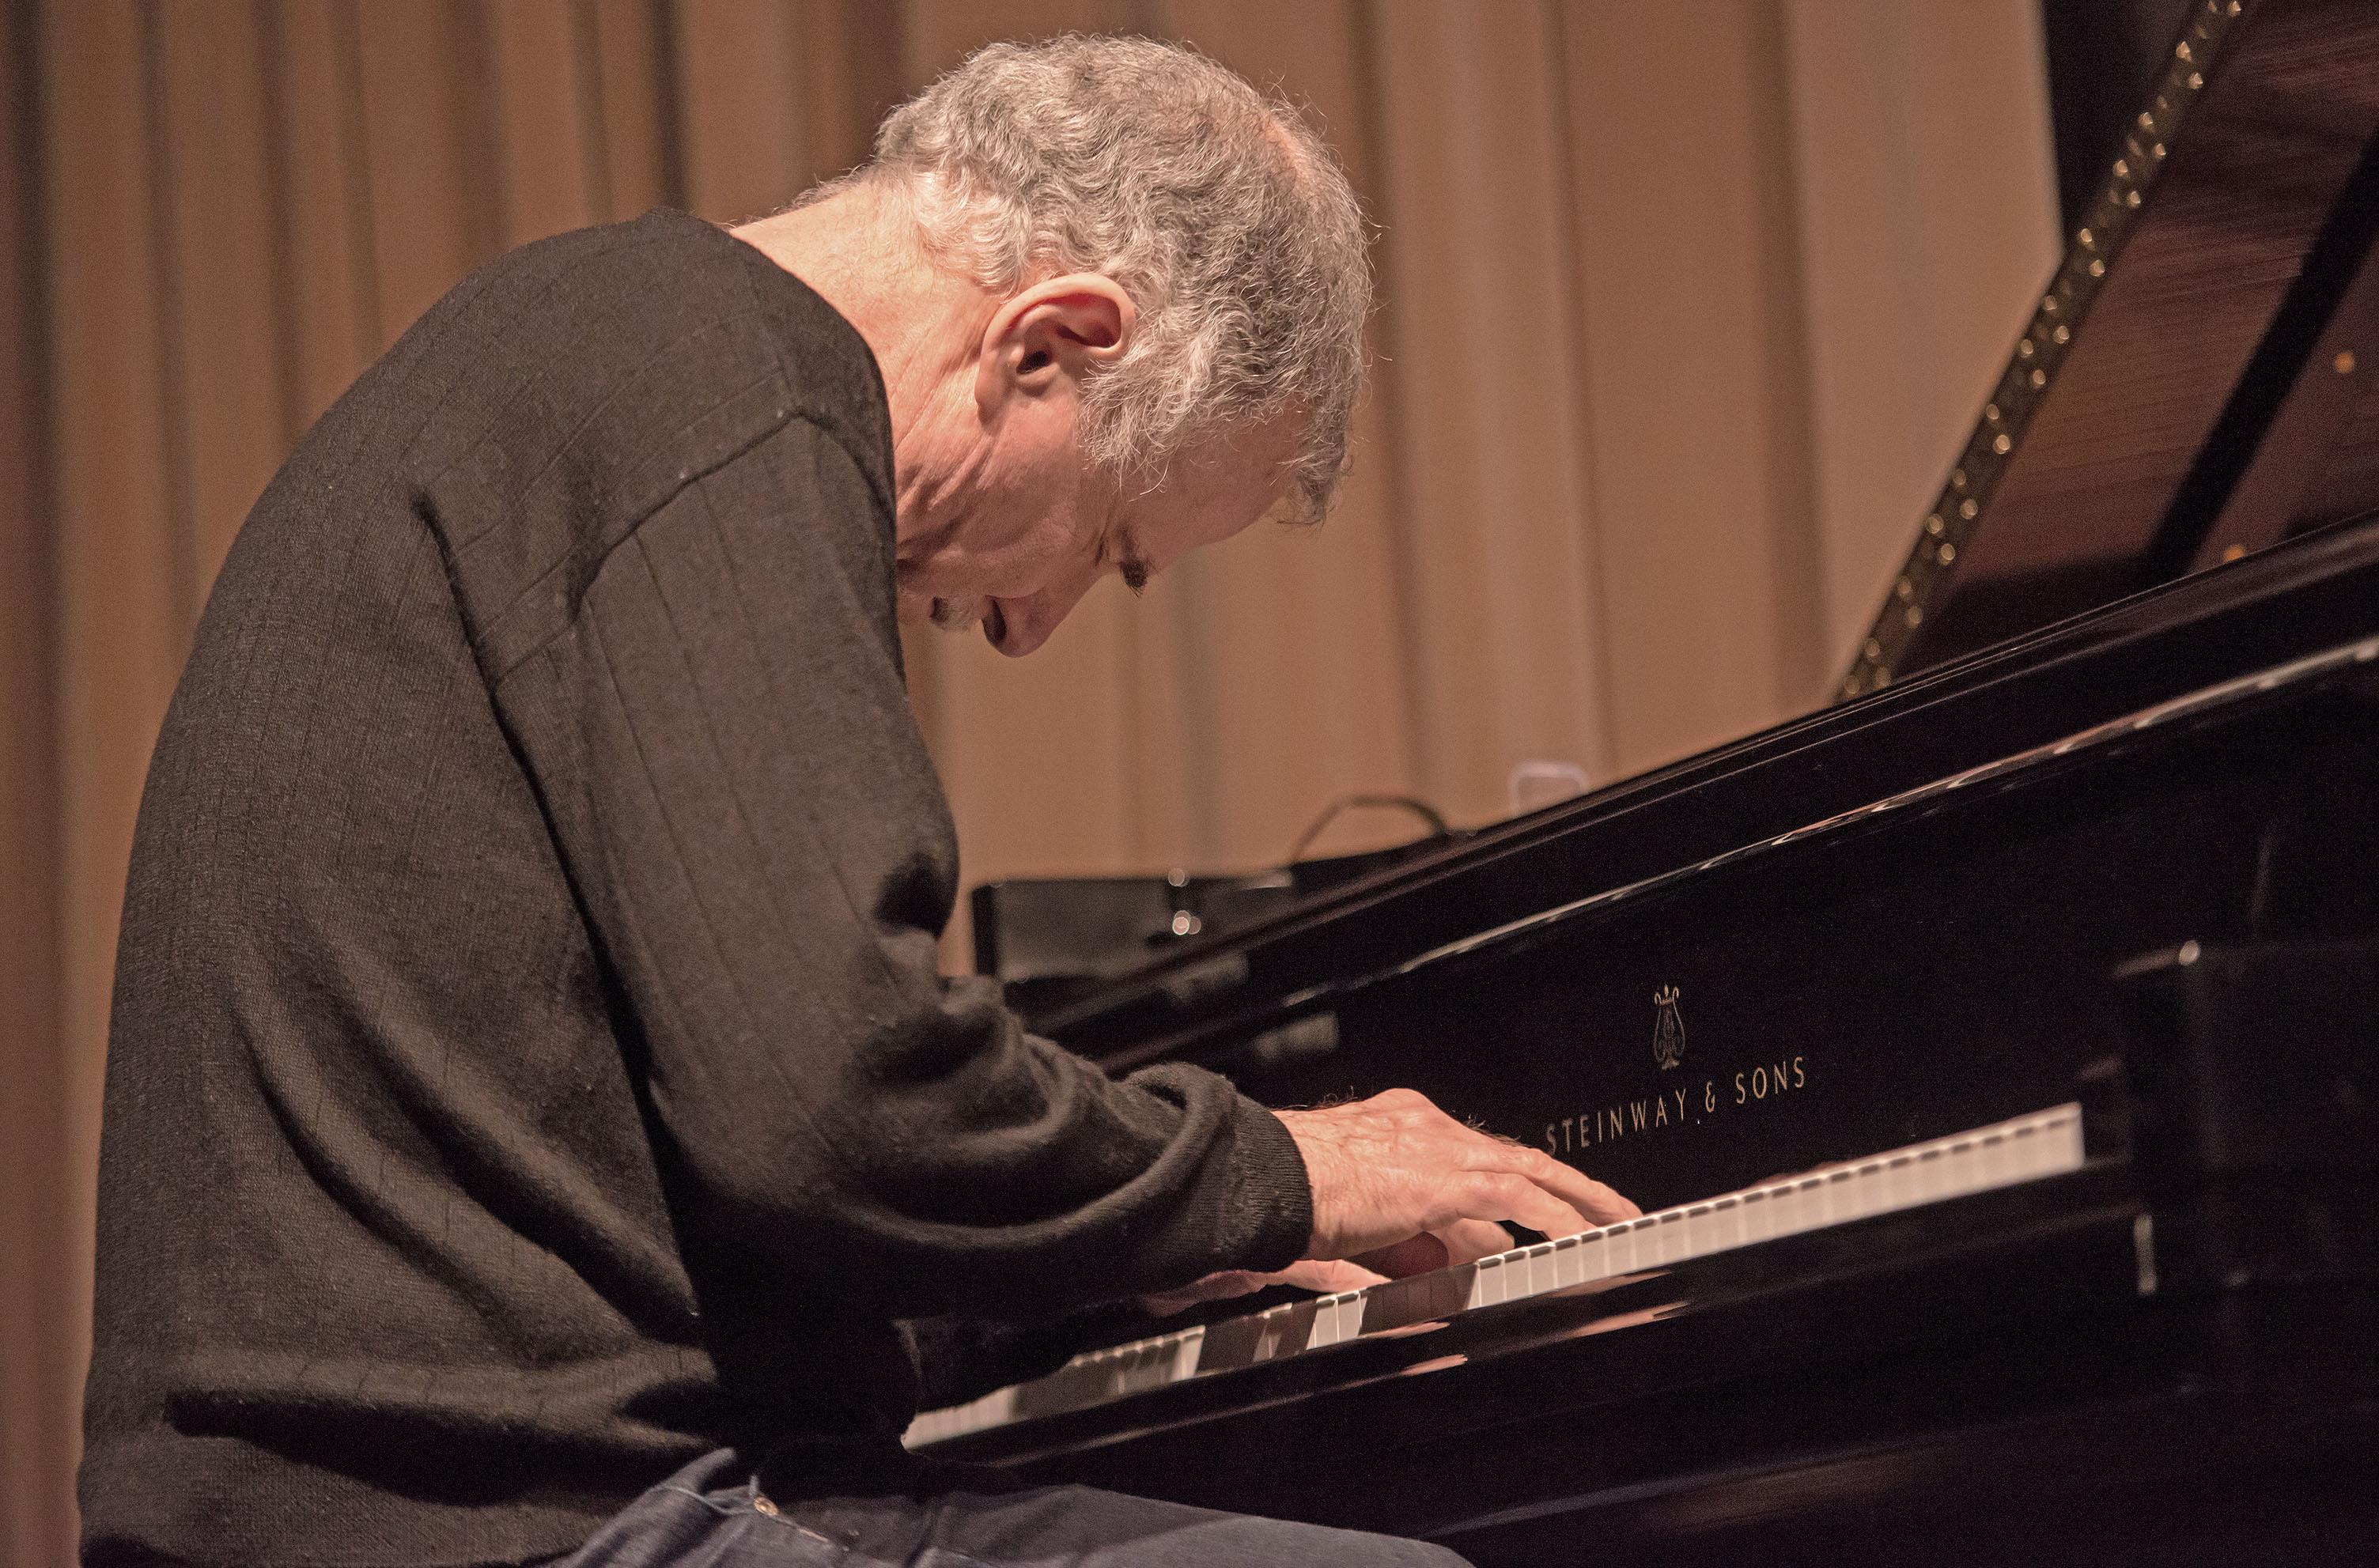 John Abercrombie Quartet, Library & Archives Canada, Ottawa, Canada 2014-02-15